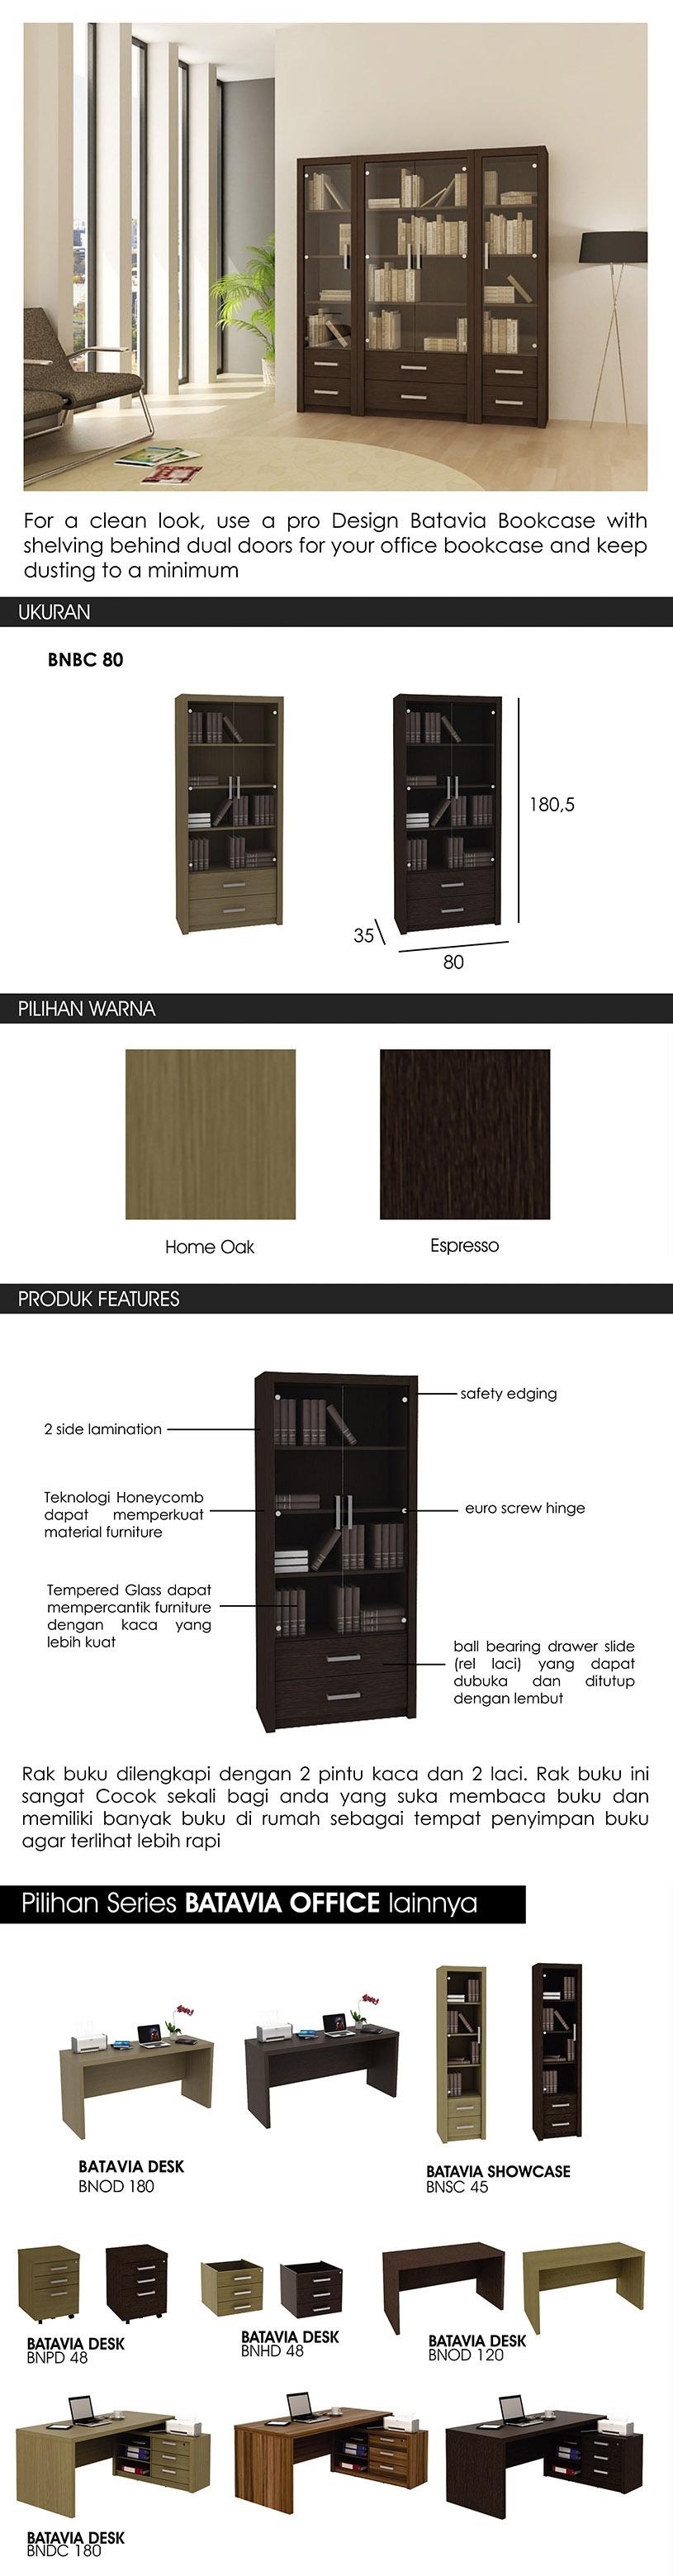 Pro Design Batavia Meja Nakas 2 Laci Espresso Khusus Jawa Bali Lemari Pakaian Pintu Dan Cermin French Walnut Rak Buku Kaca